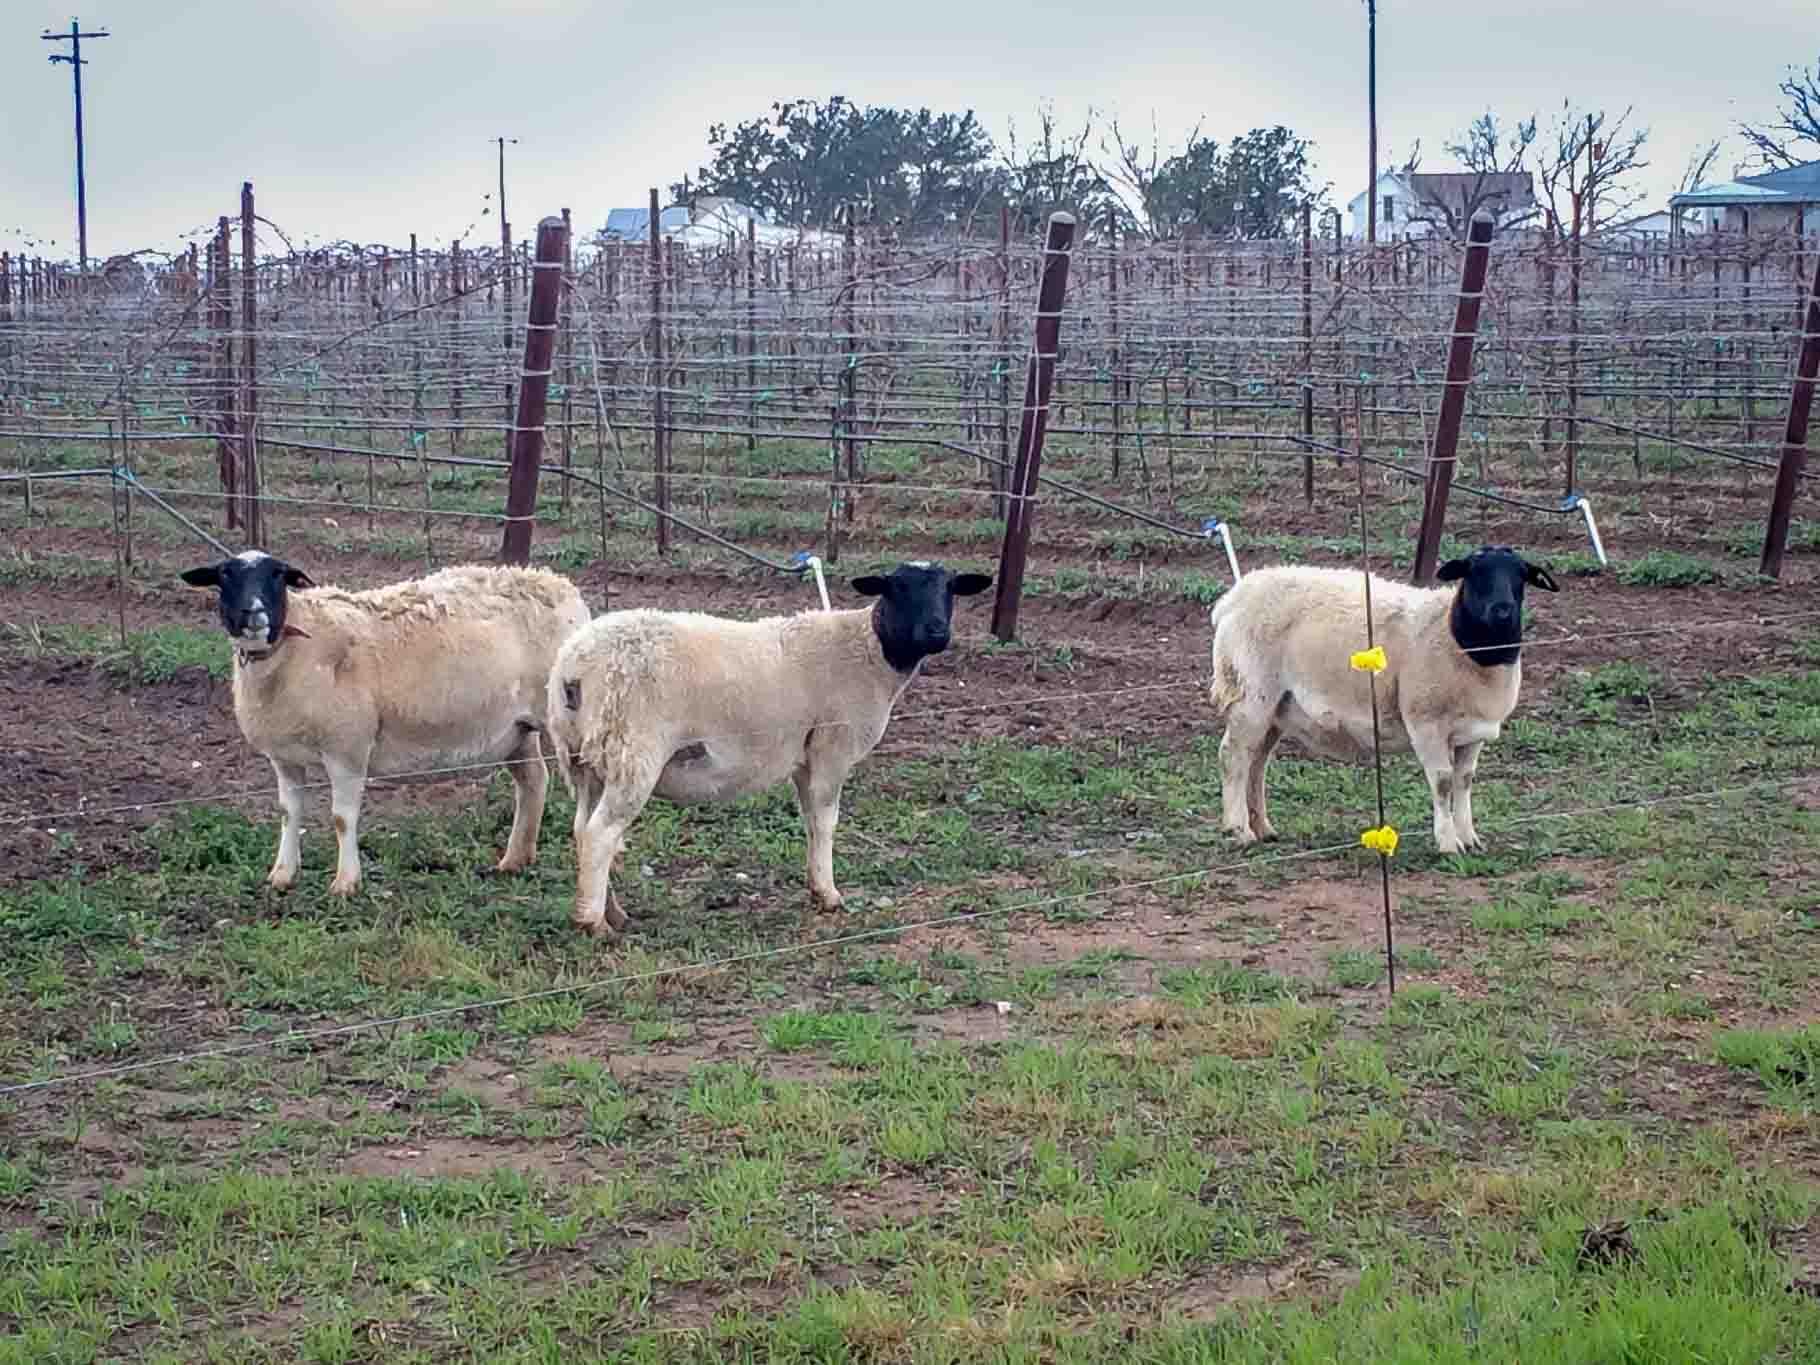 Sheep in a vineyard